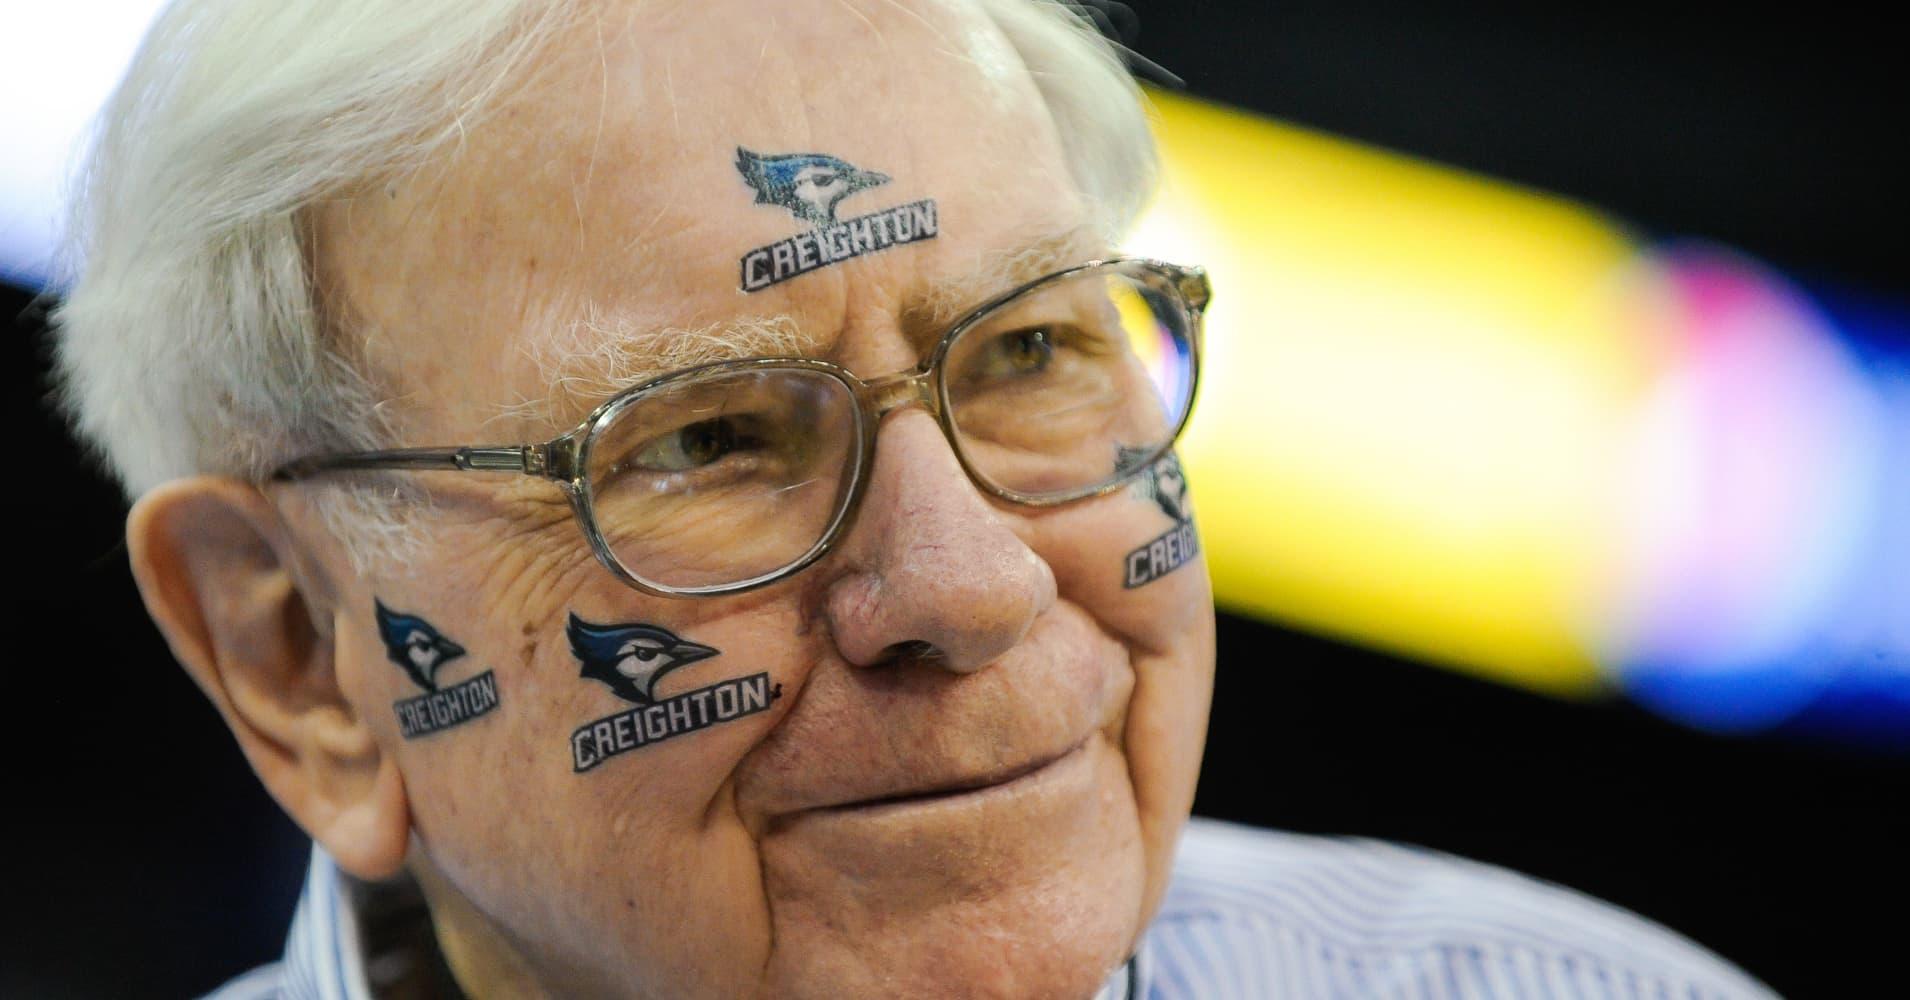 Warren Buffett at a Creighton Bluejays NCAA basketball game in Omaha, Nebraska.